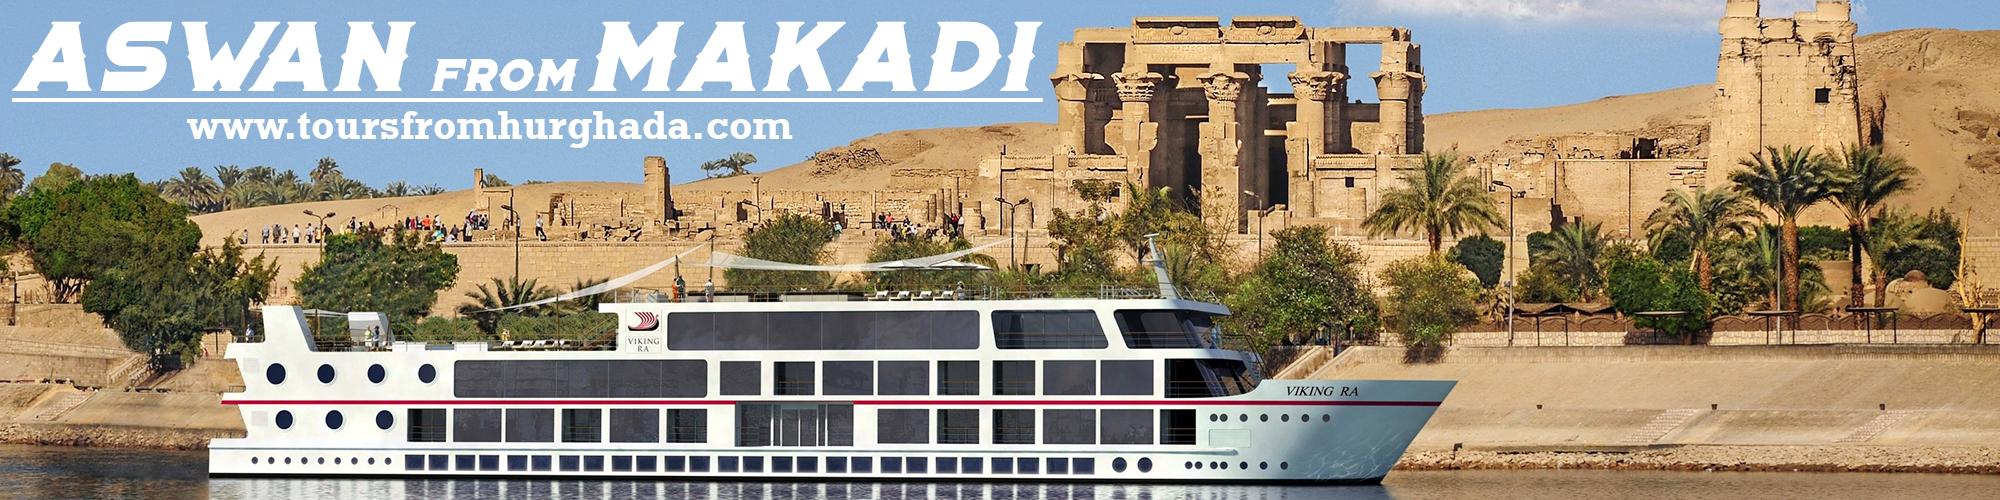 Trips To Aswan From Makadi Tours From Hurghada